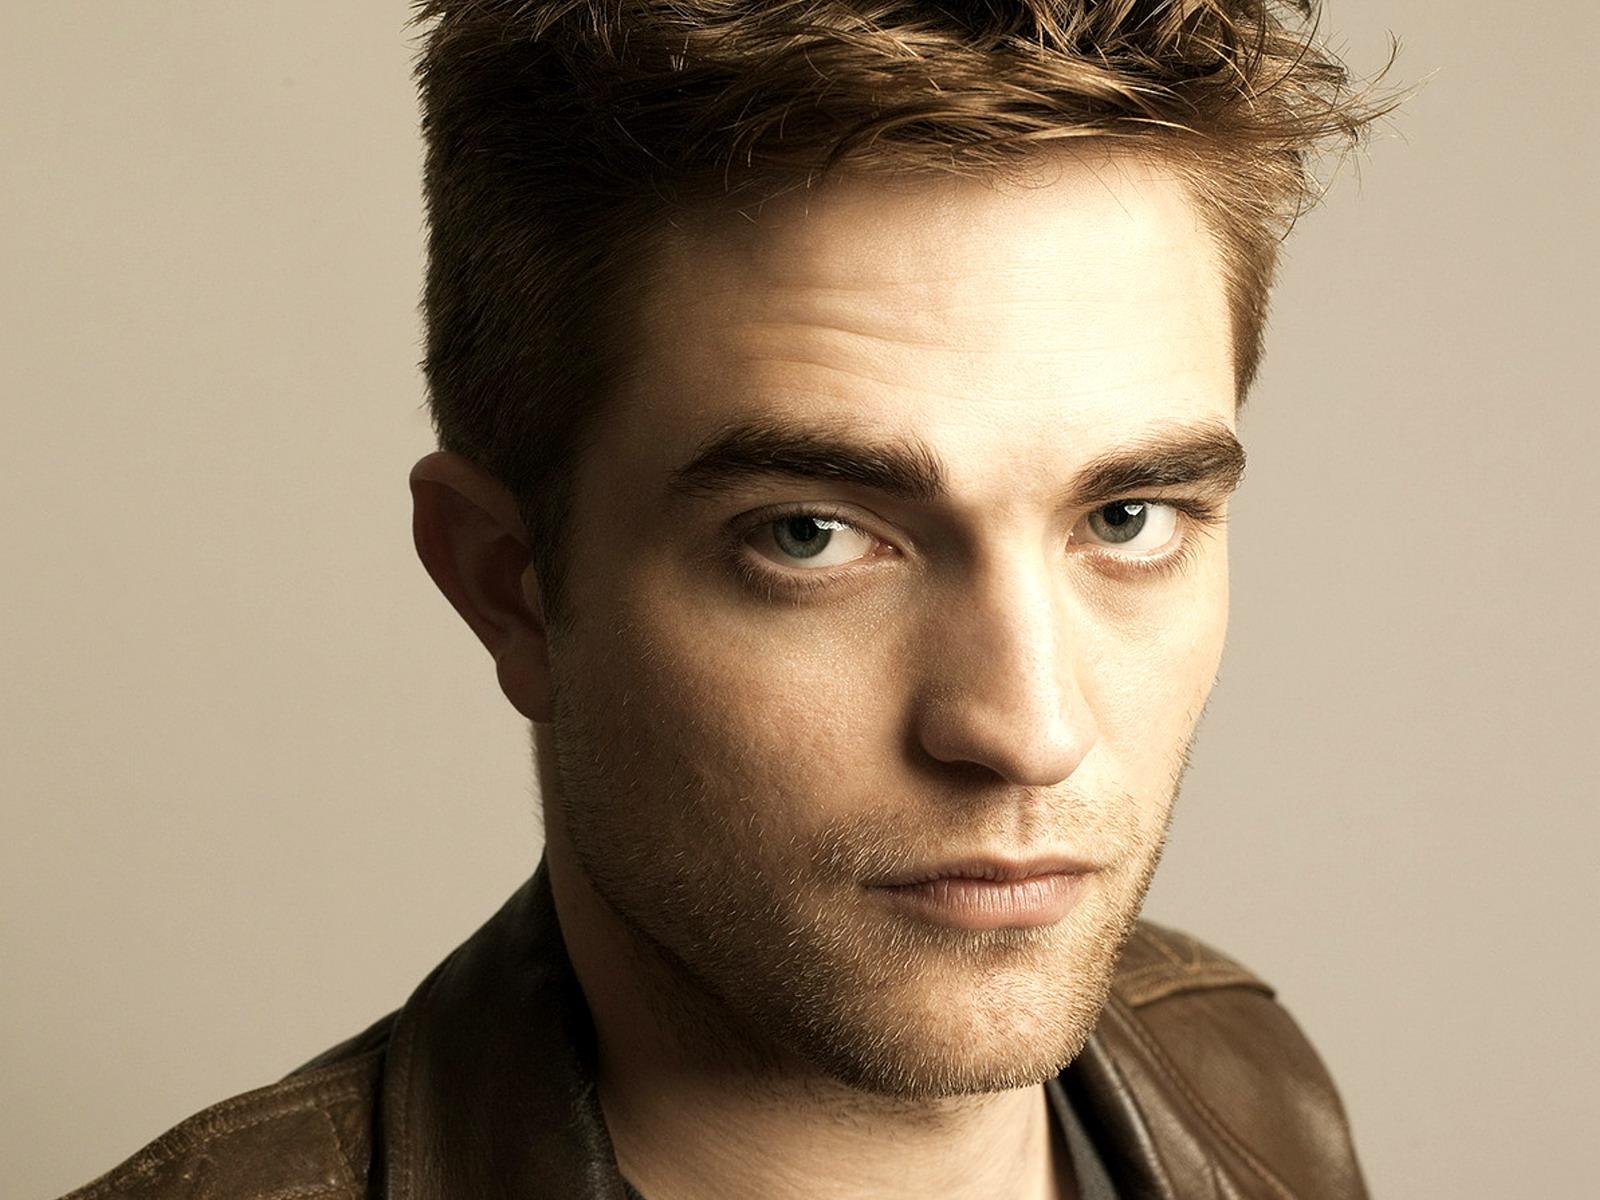 Robert Pattinson 15 HD Screensavers